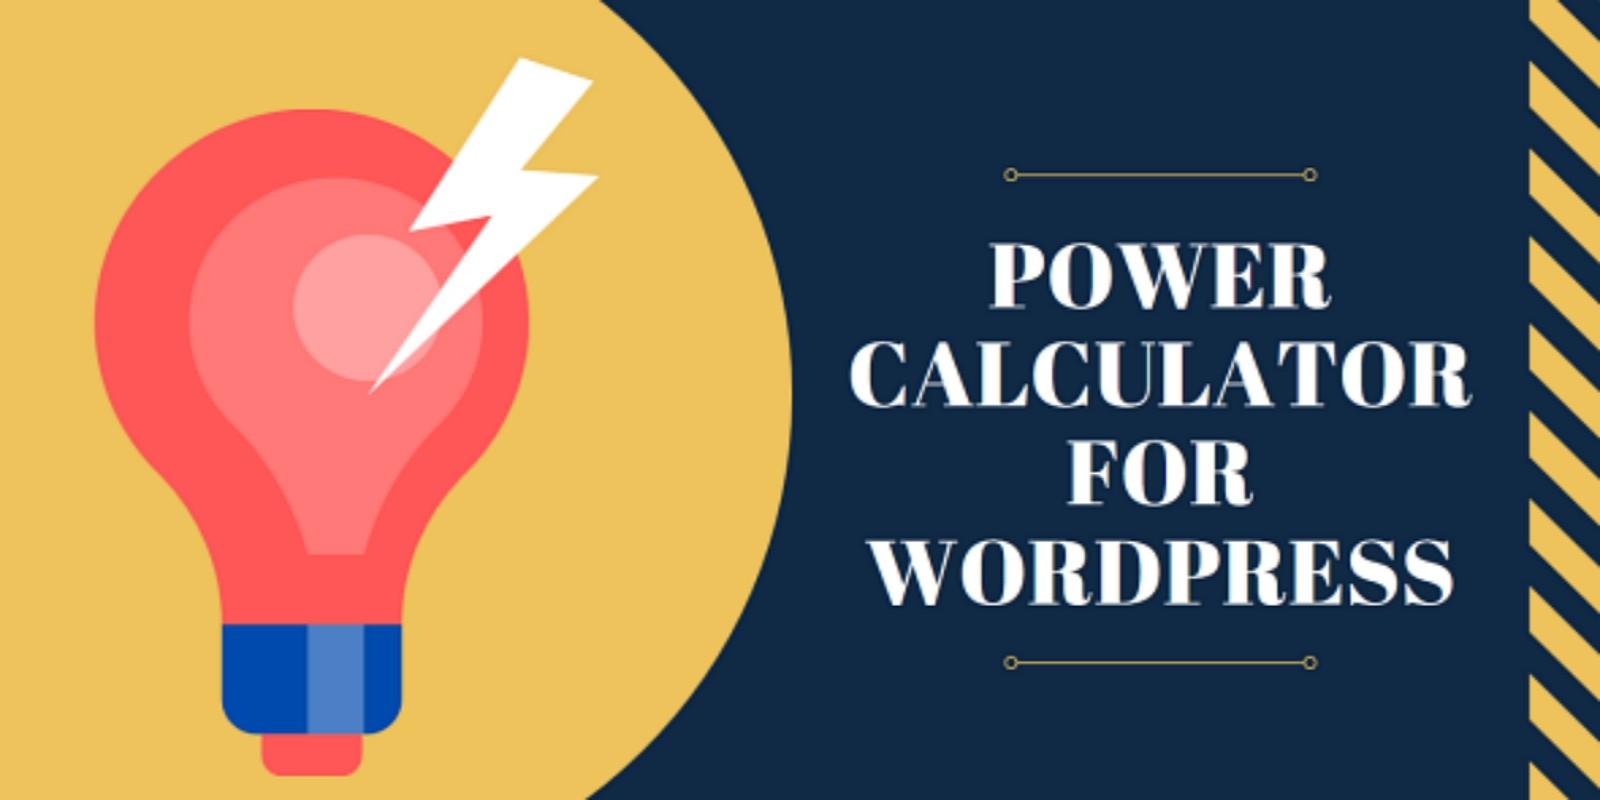 Power Calculator For Wordpress